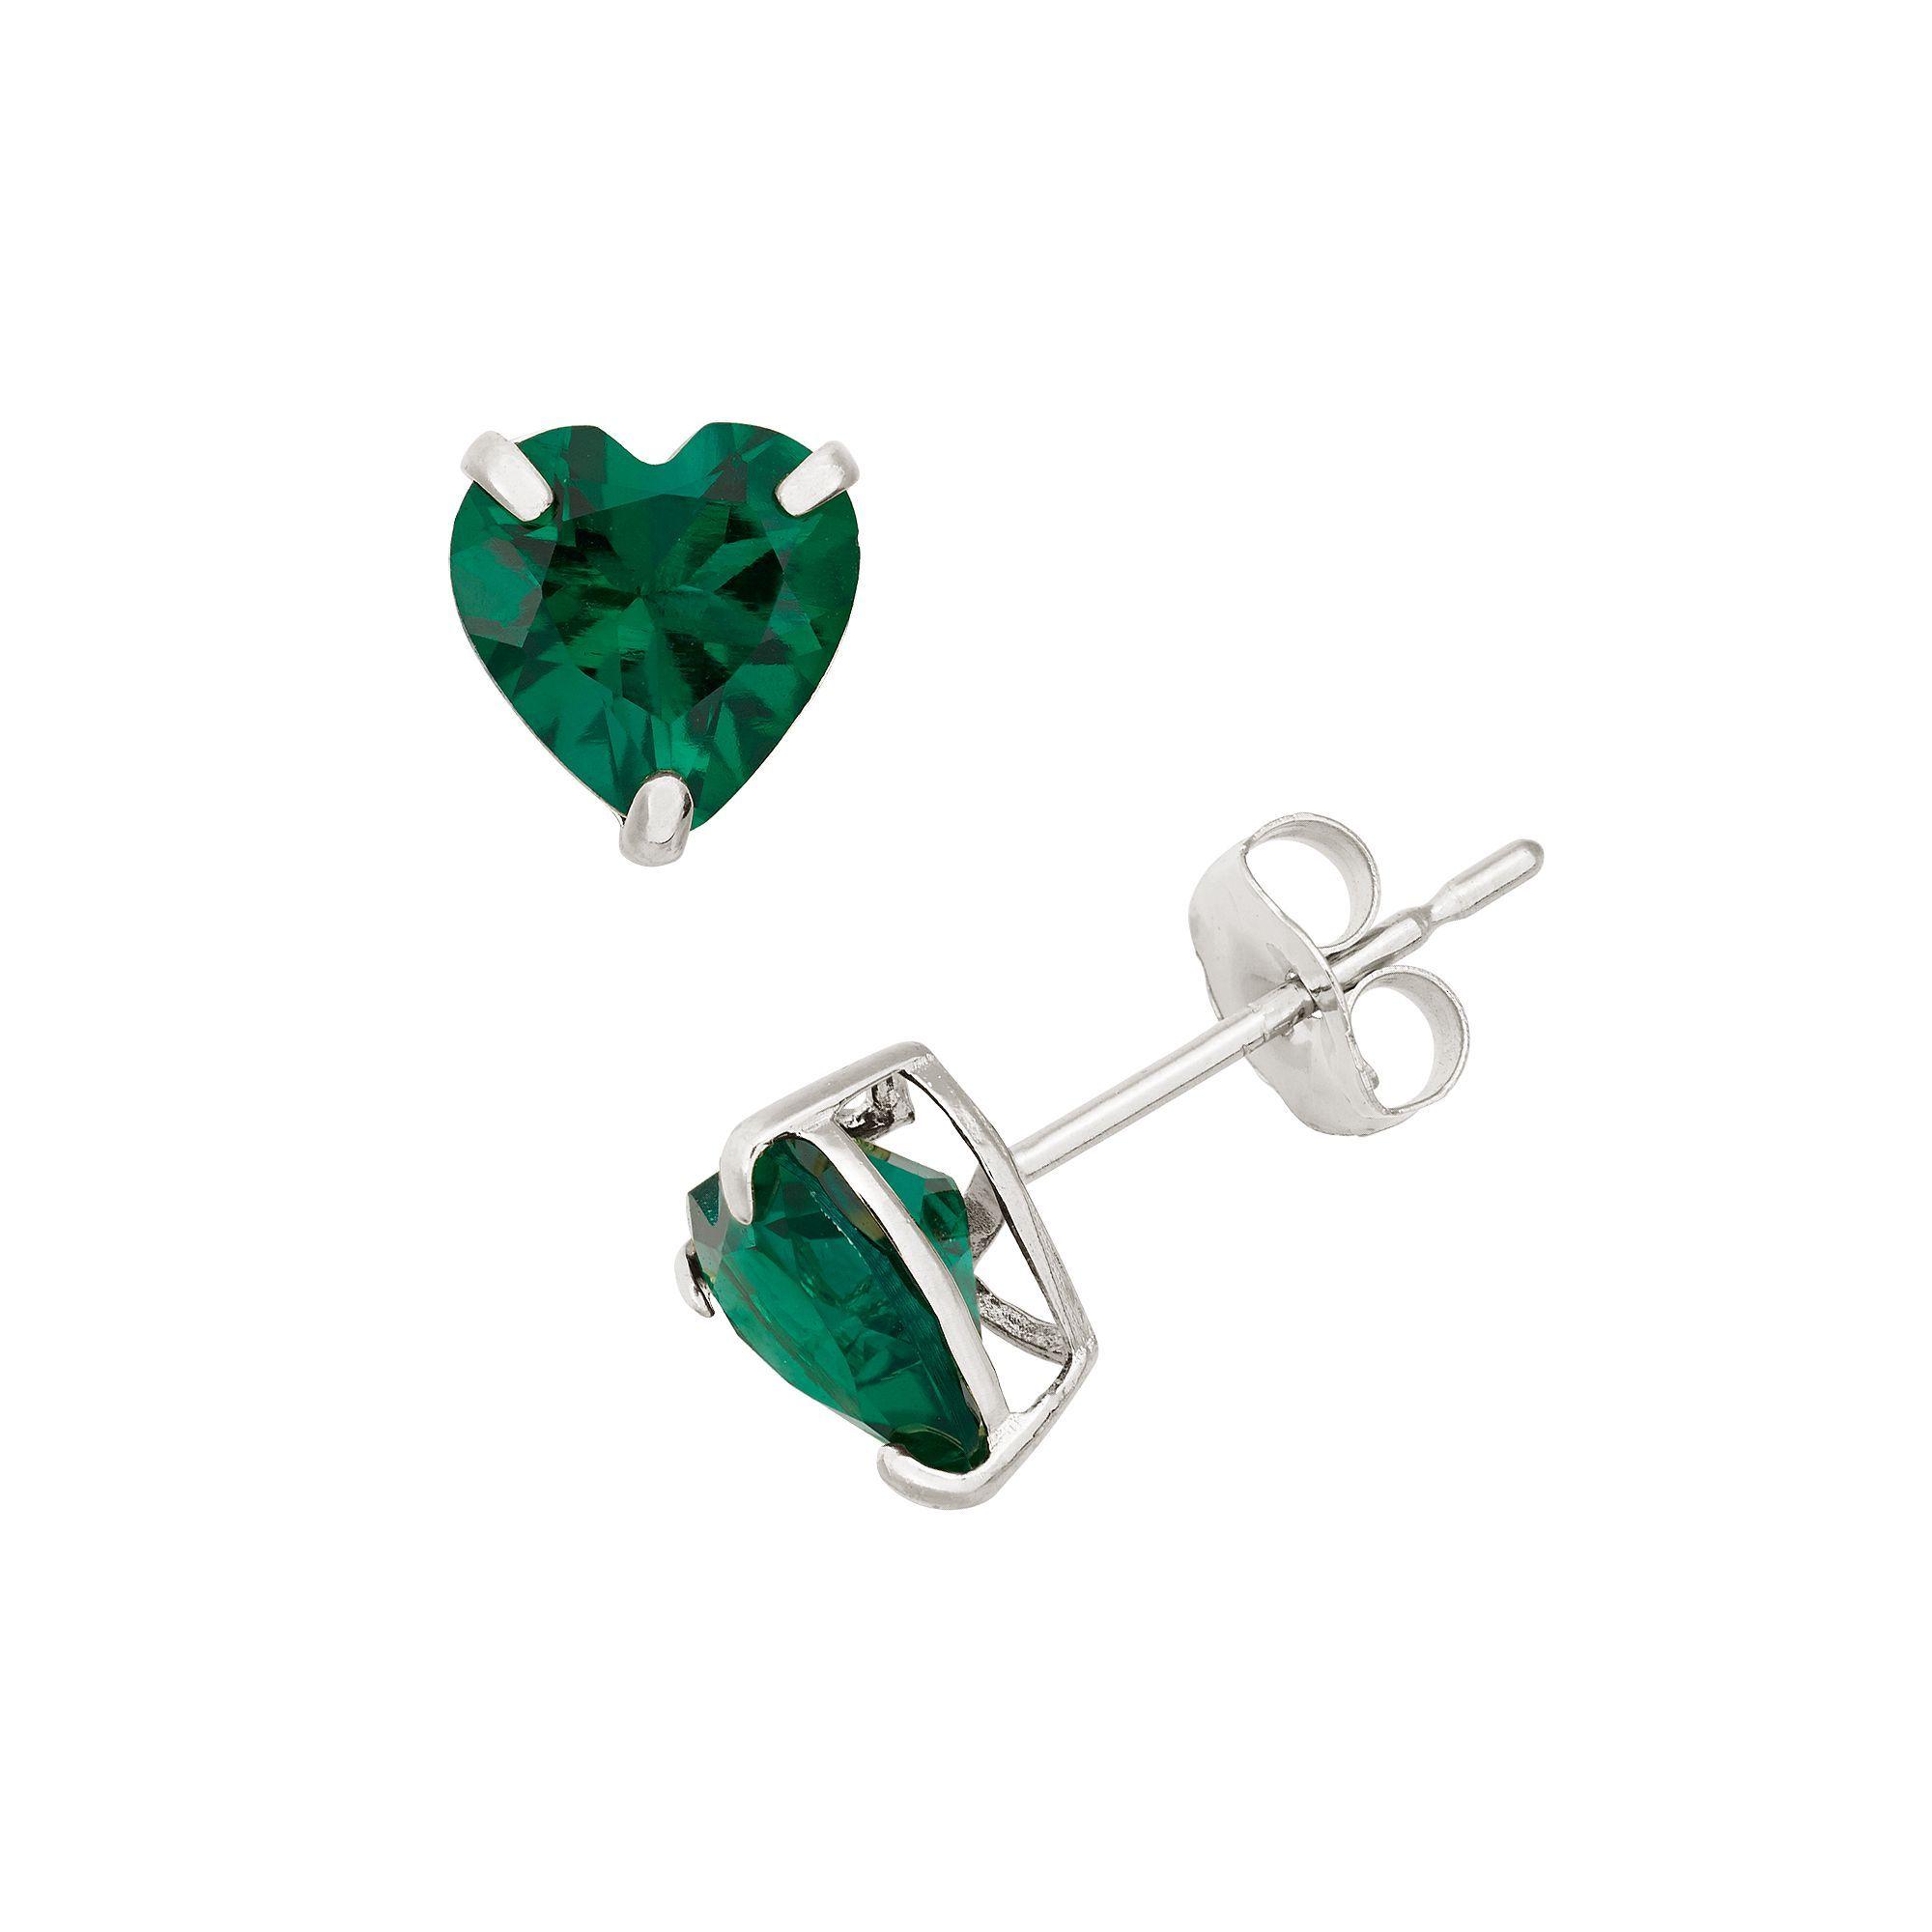 724bf3319 Lab-Created Emerald 10k White Gold Heart Stud Earrings, Women's, Green